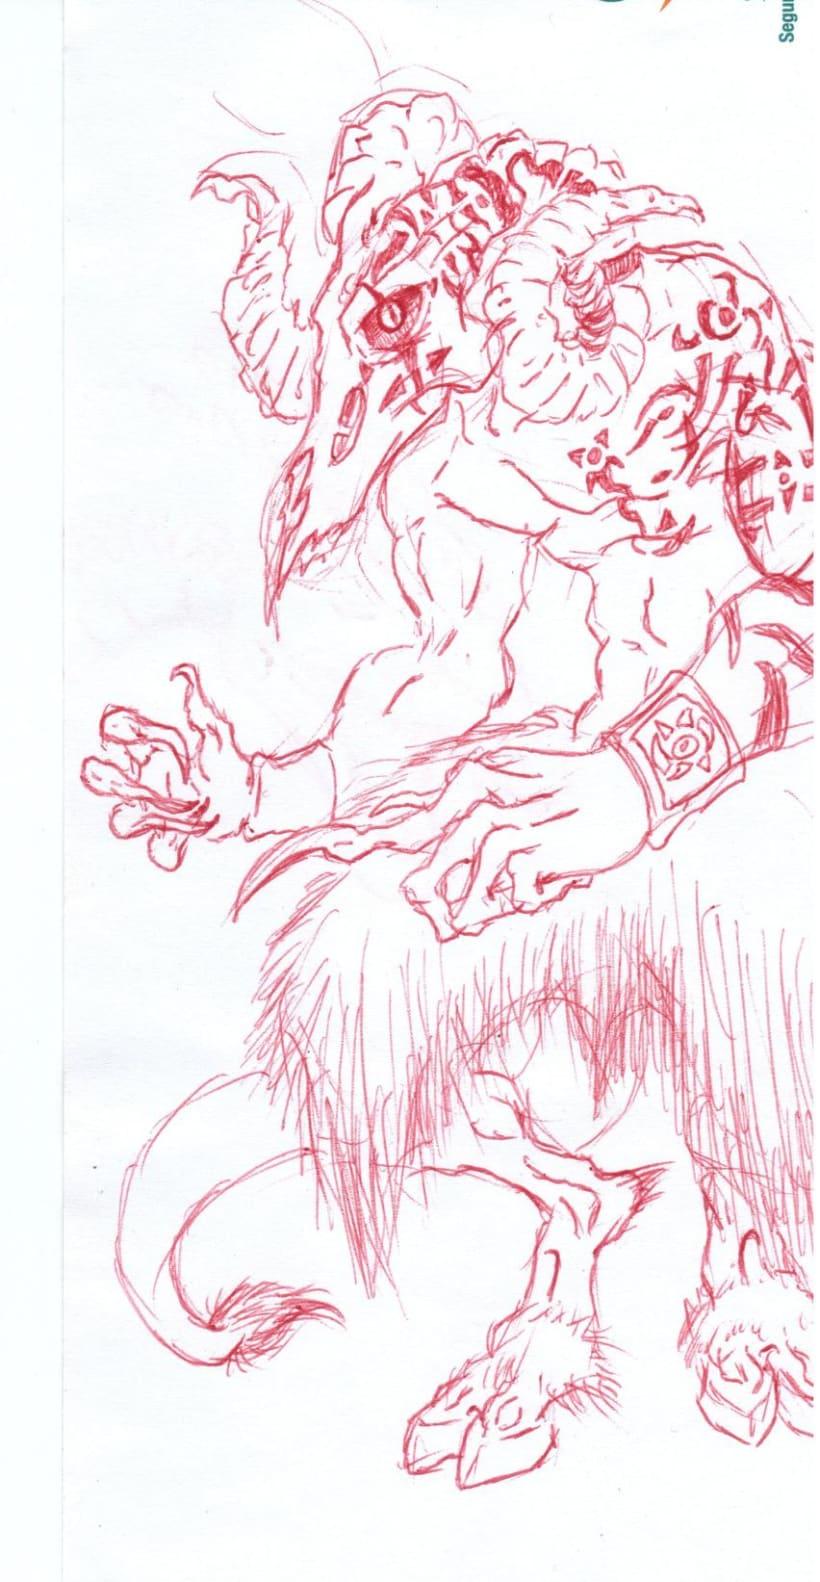 varios dibujos a boli 8